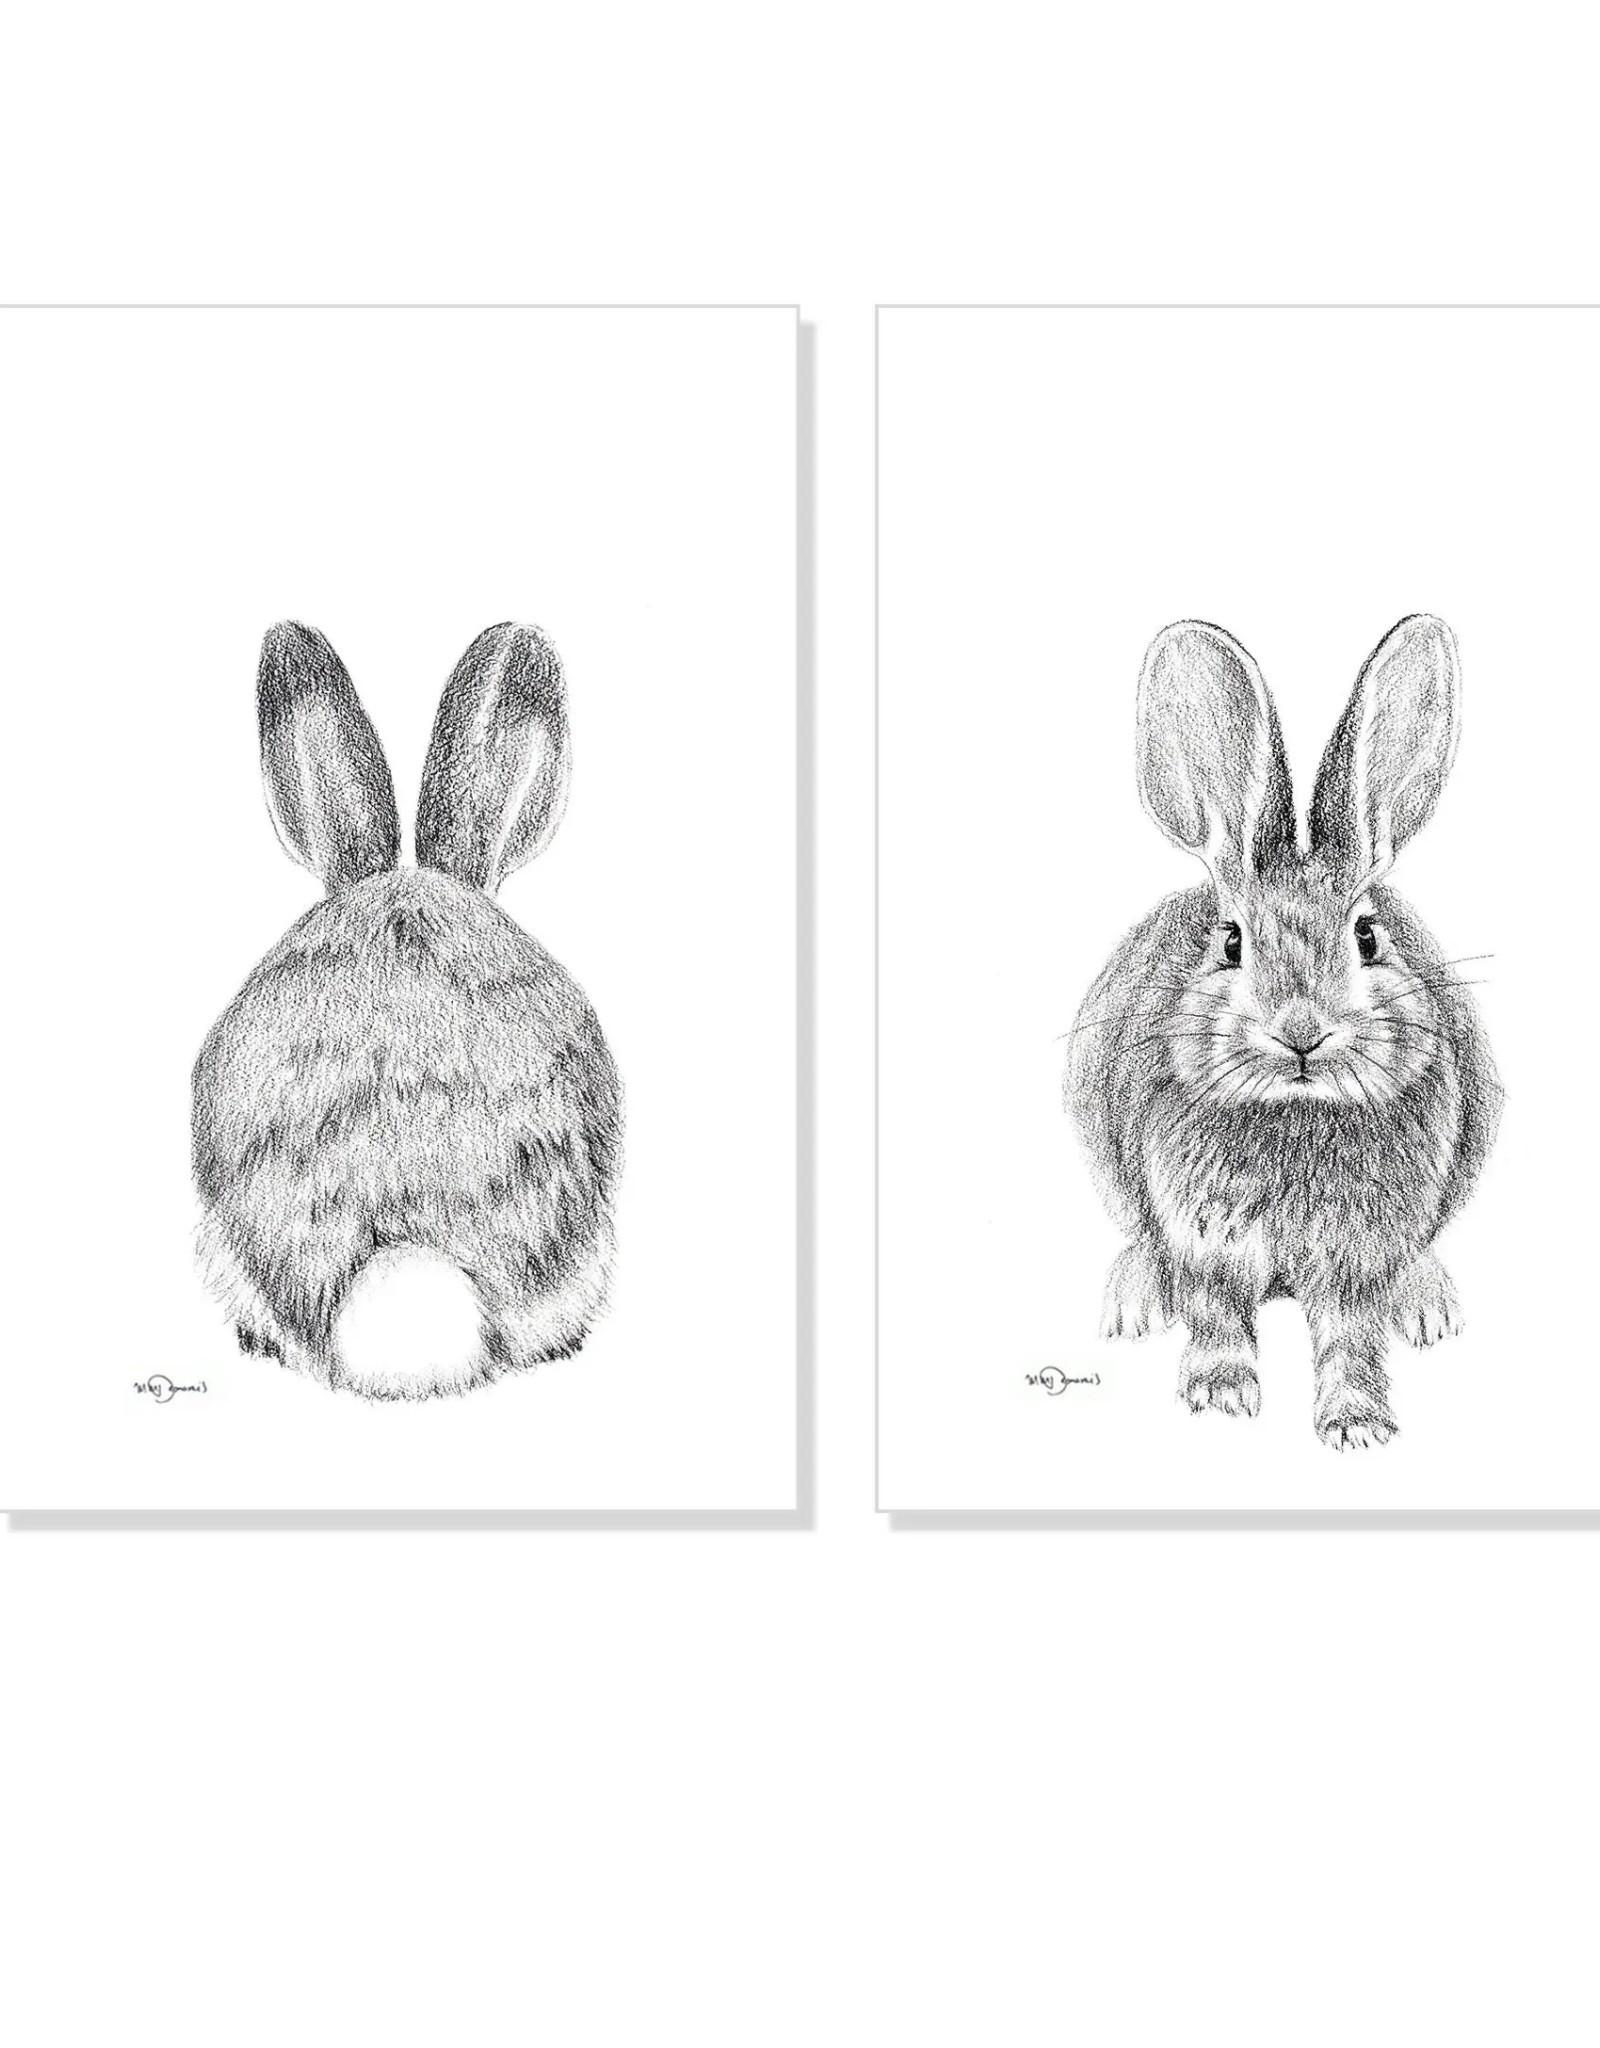 Le Nid - Duo Adorable Rabbits Print  Paper  - 12x18